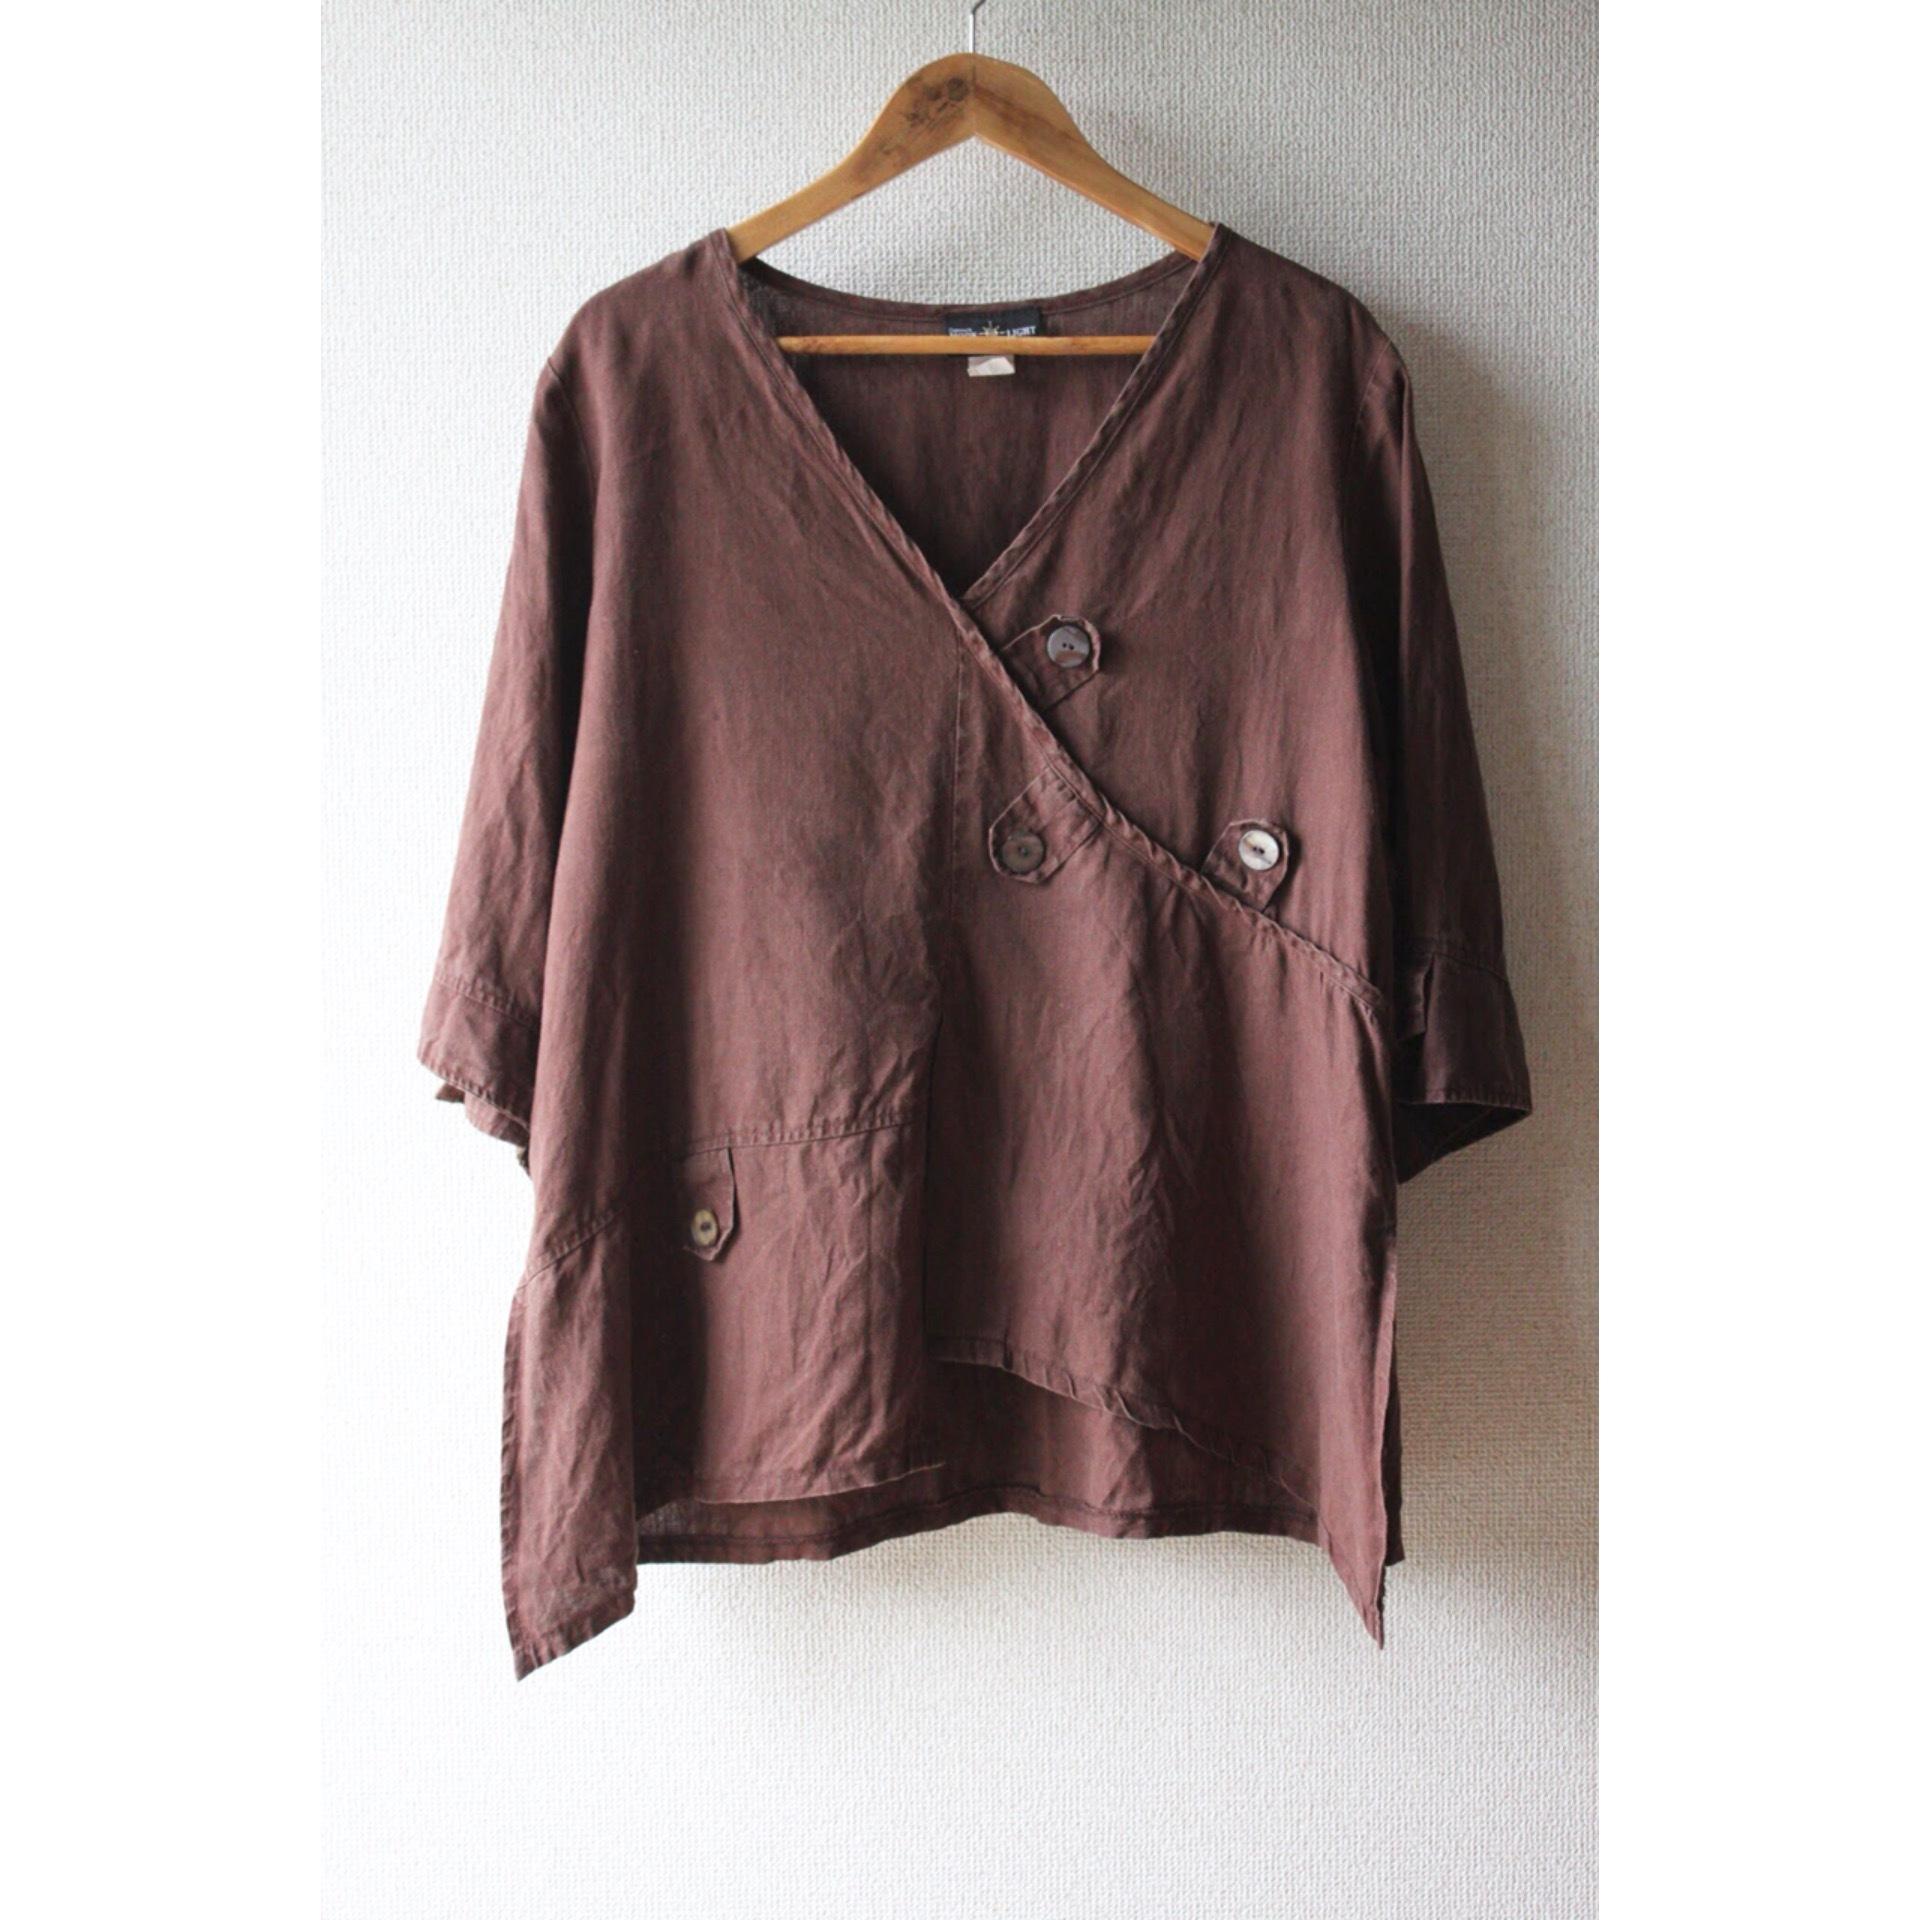 Vintage linen pullover shirt